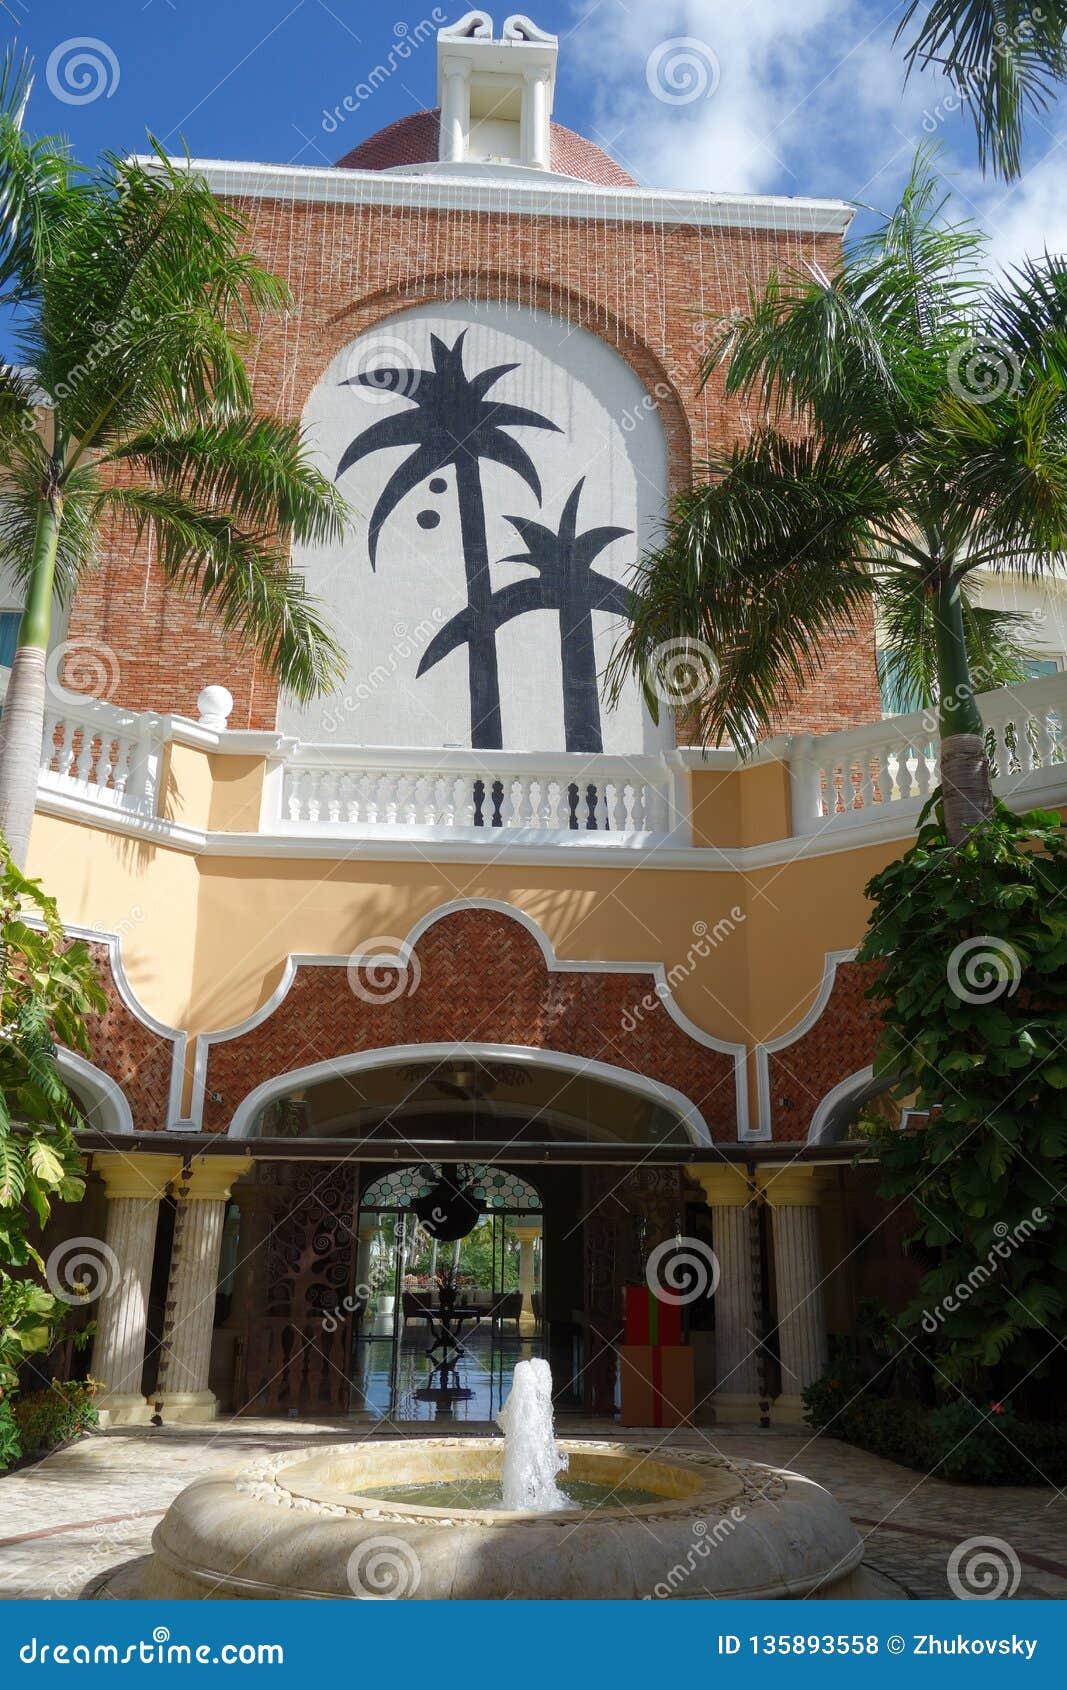 Iberostar Grand Hotel Bavaro Resort In Punta Cana Dominican Republic Editorial Stock Photo Image Of Beach Interior 135893558